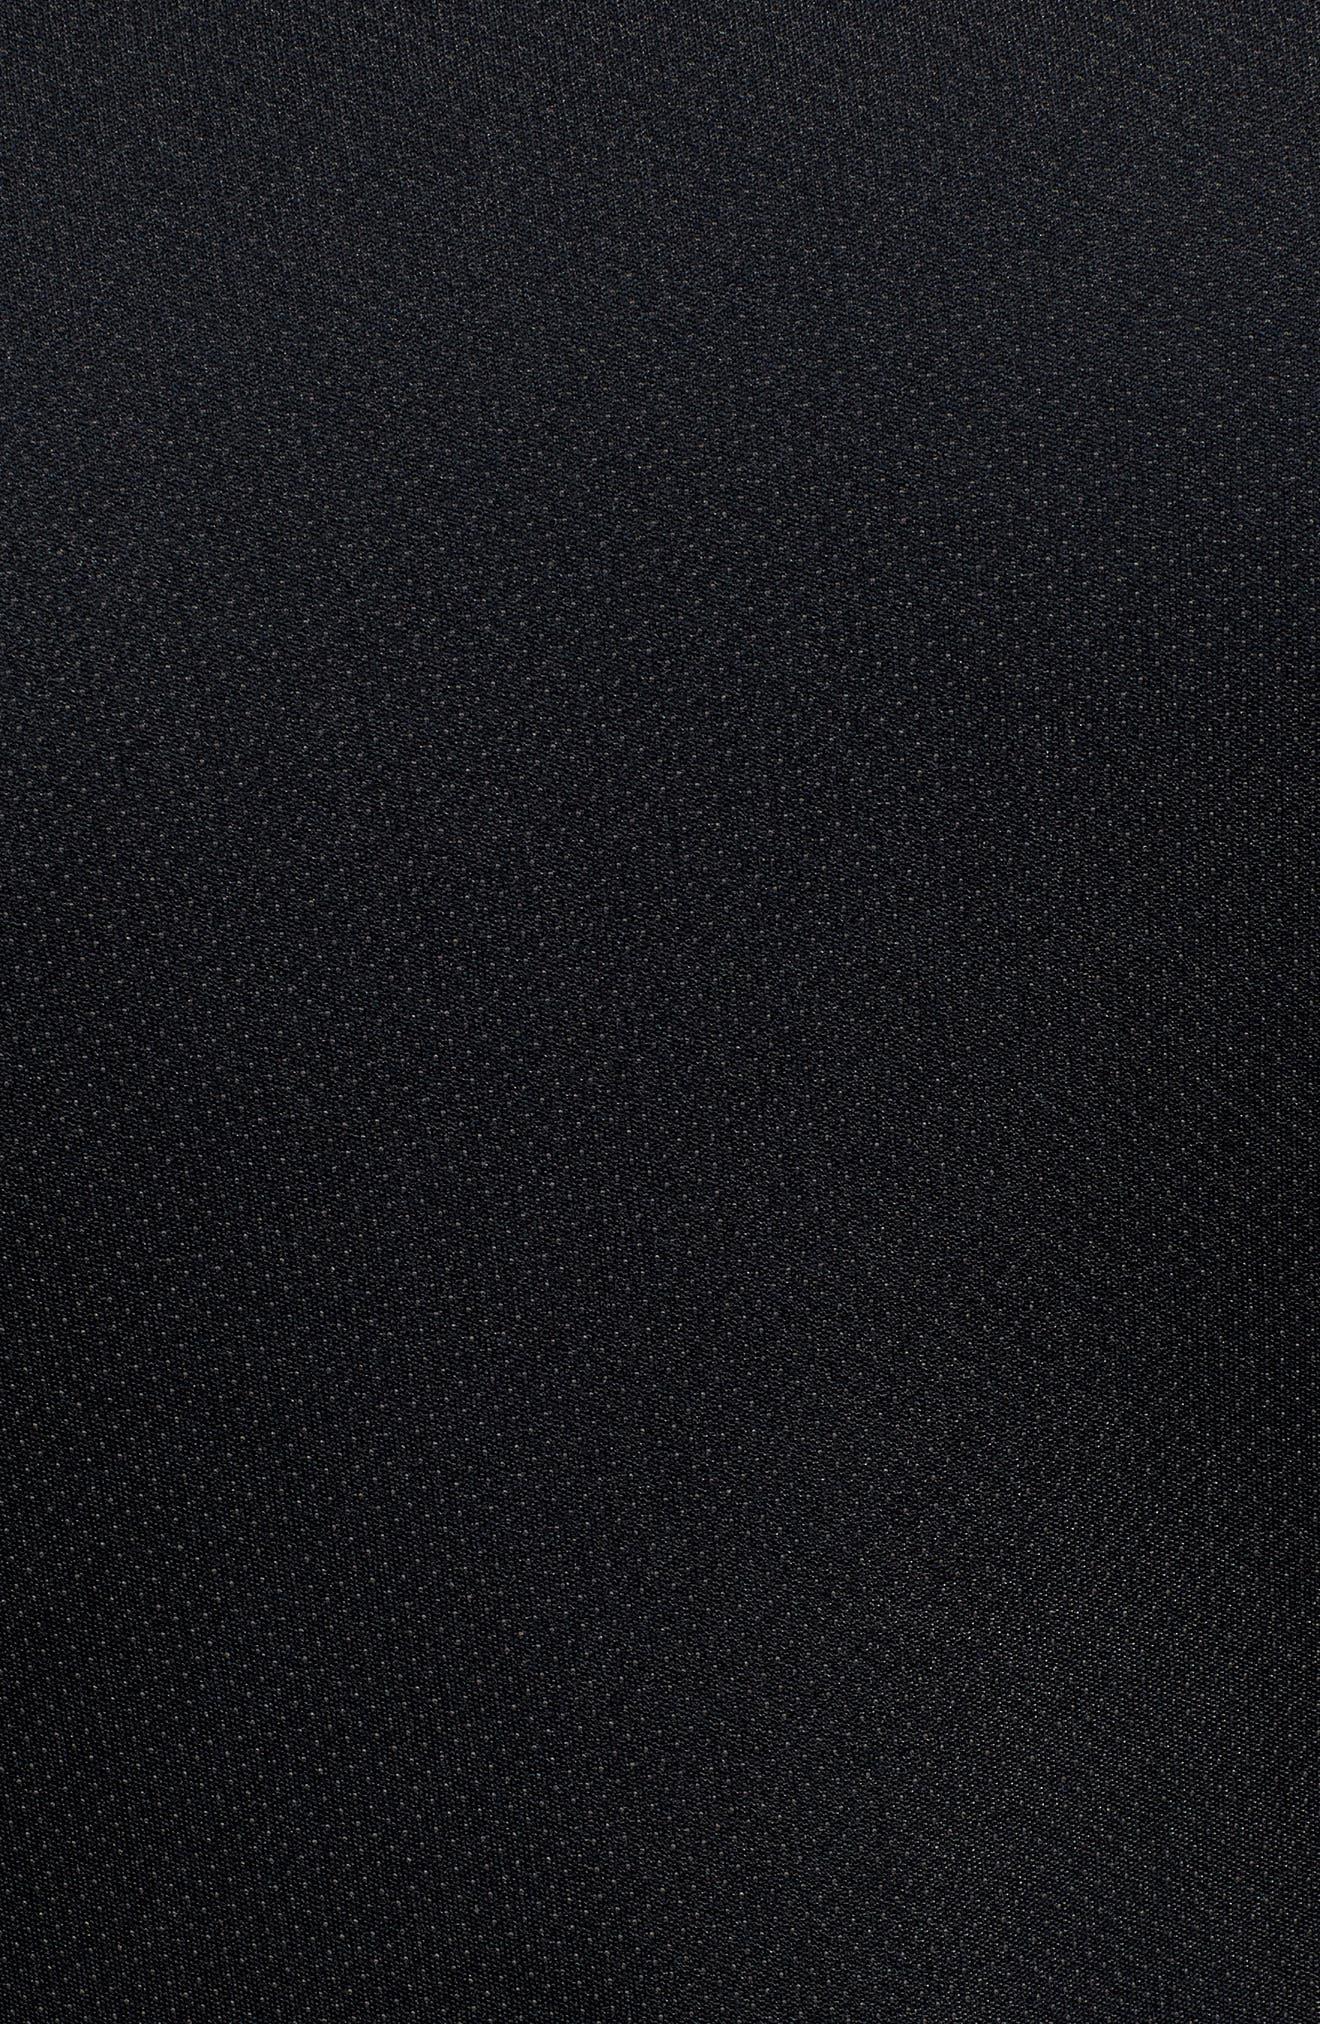 Unstoppable /MOVE Jacket,                             Alternate thumbnail 6, color,                             BLACK/ CHARCOAL/ BLACK